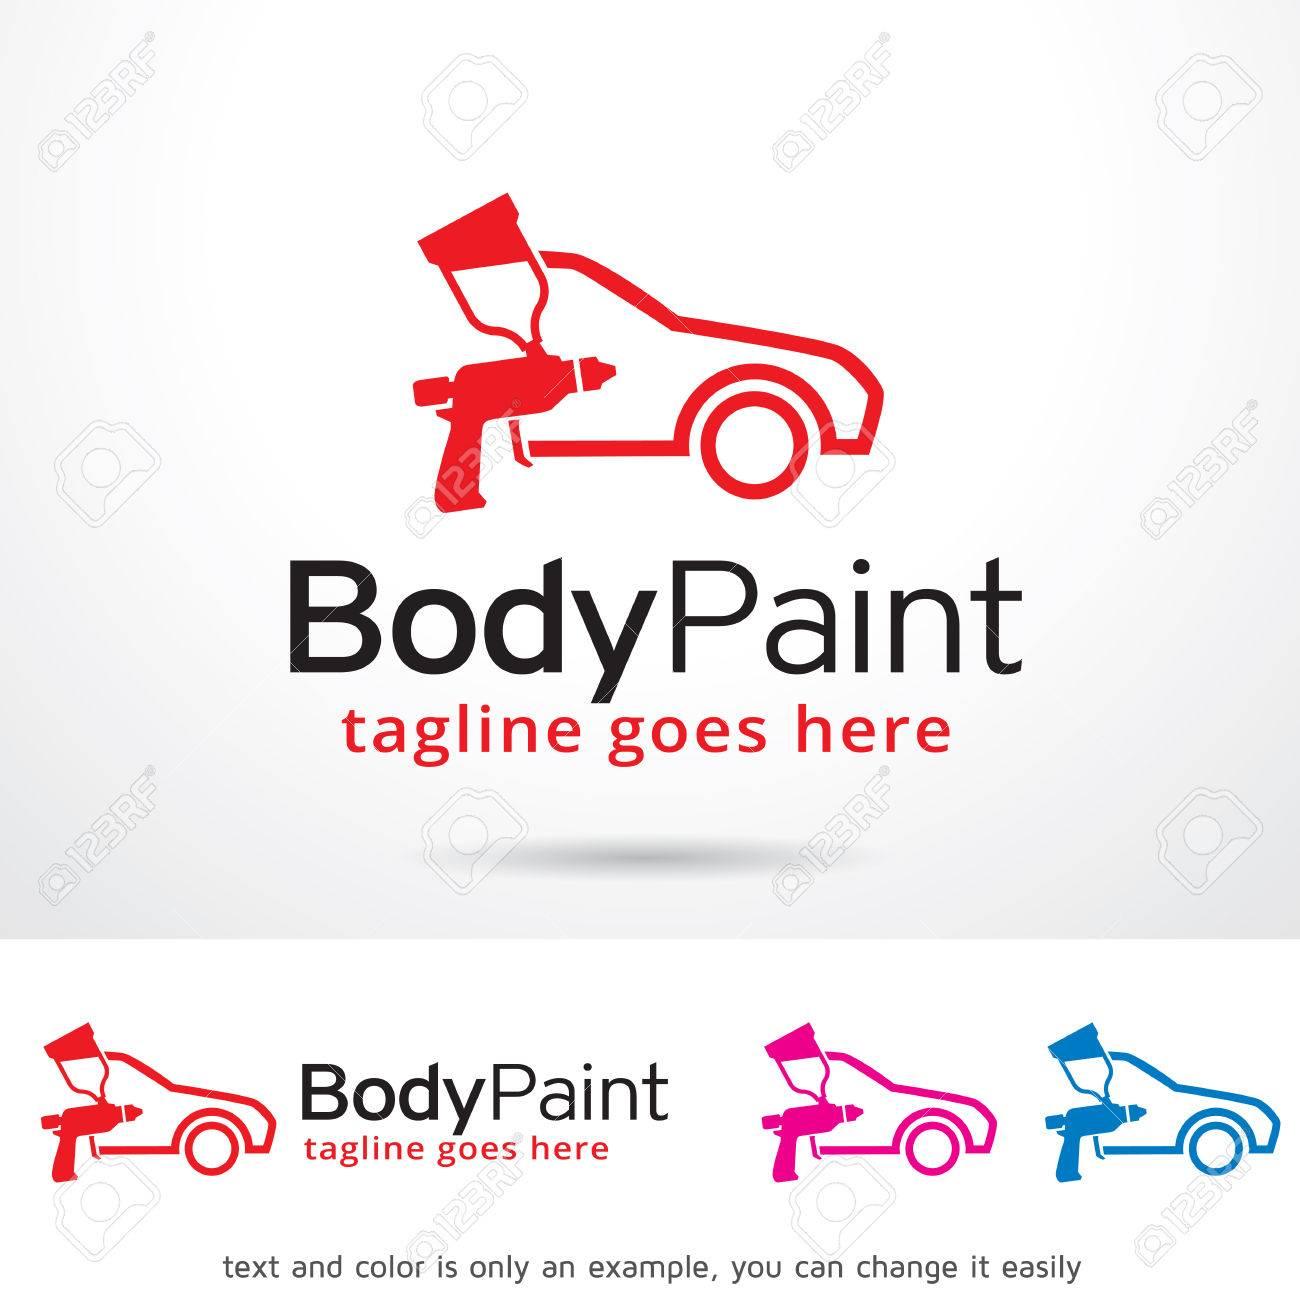 design templates vectors car vector resume templates high school 68996359 car body paint logo template design - Wwwresume Formatcom